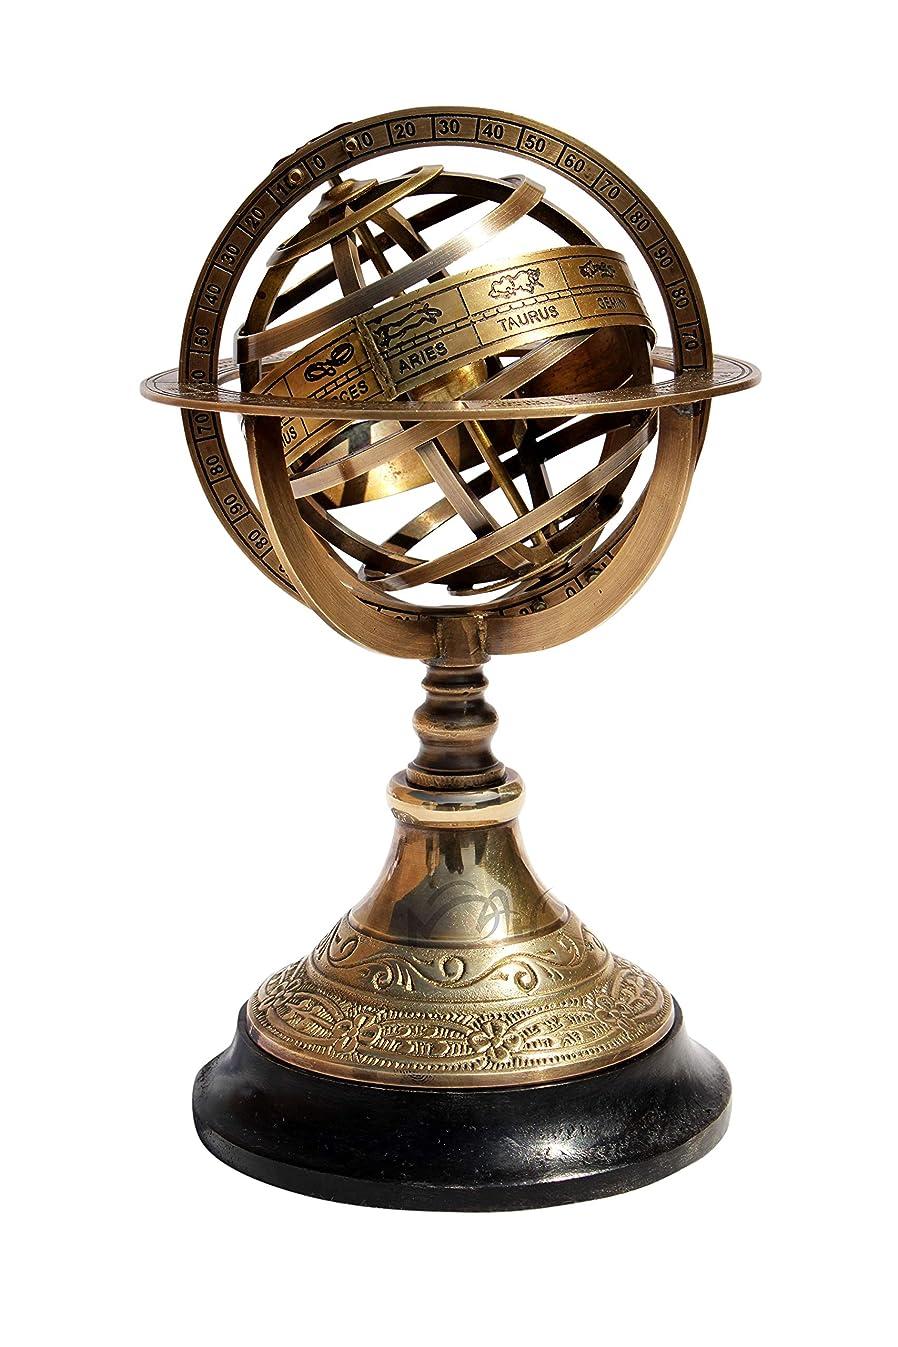 MAH Engraved Brass Tabletop Armillary Nautical Sphere Globe Engraved Brass Tabletop Armillary Nautical Sphere Globe Antique Style C-3281